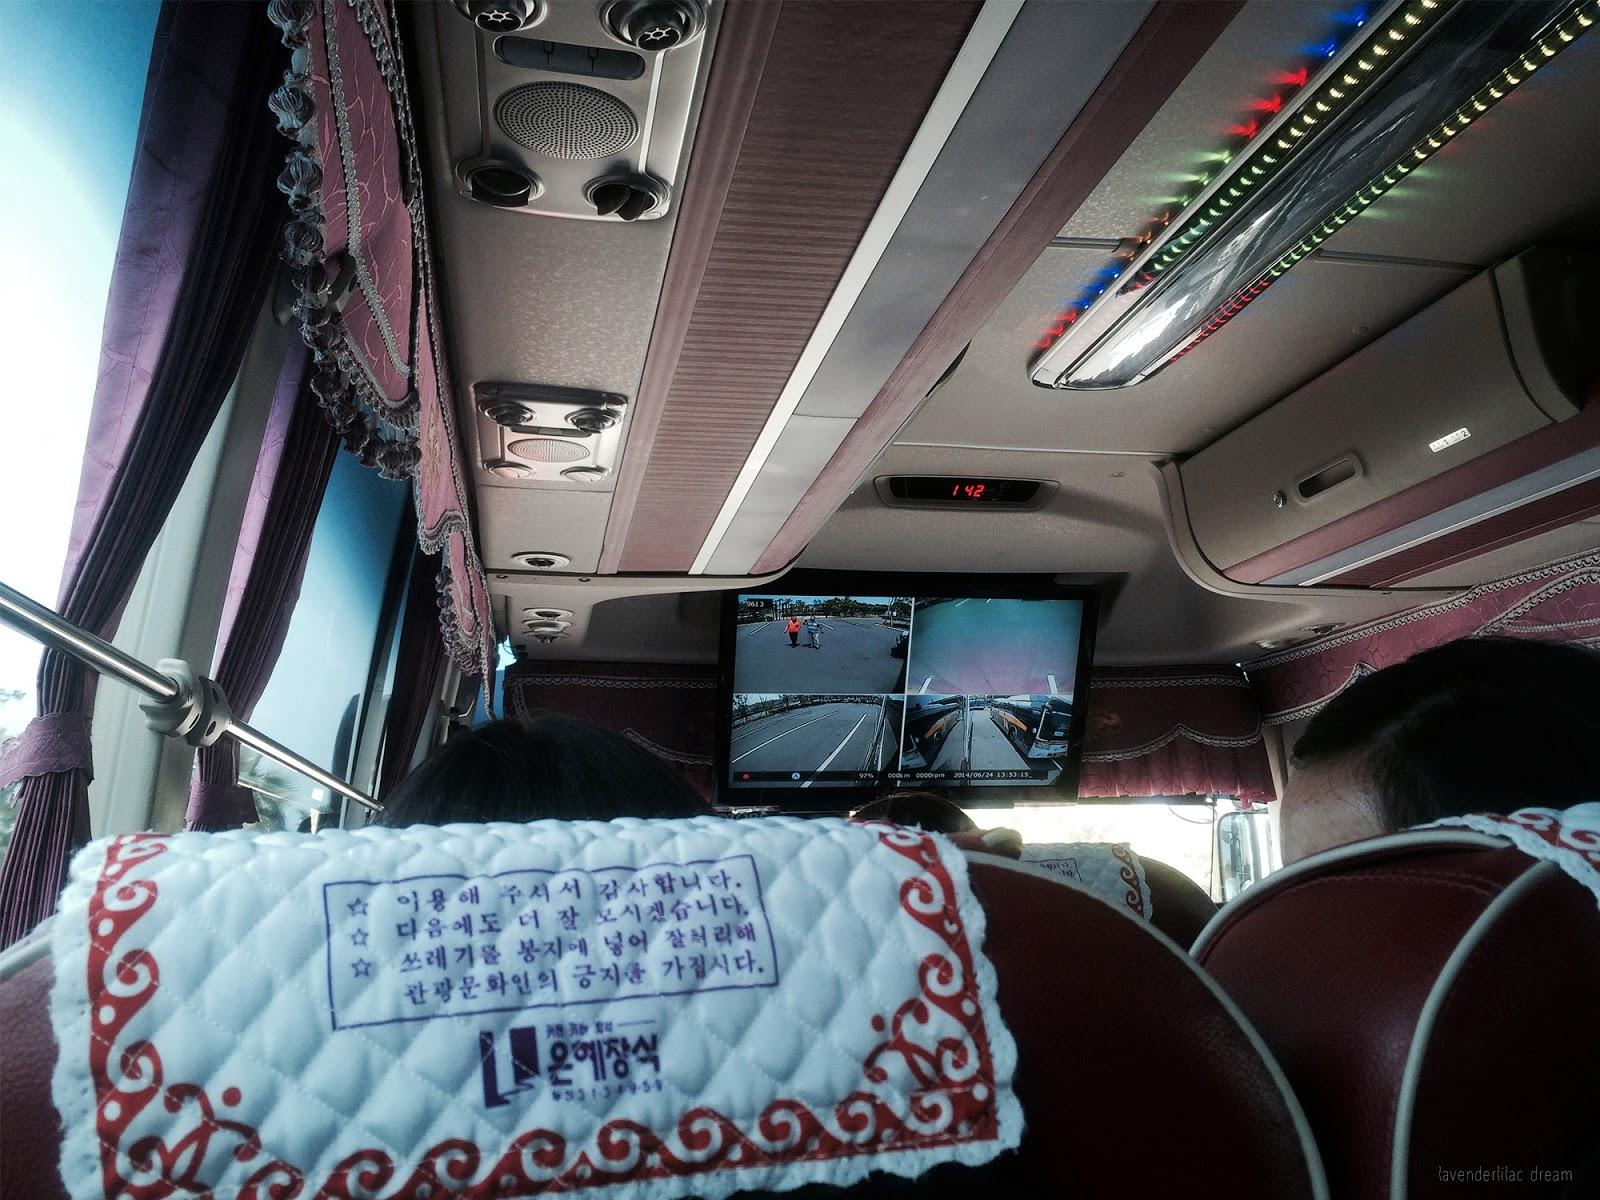 South Korea, Yonsei University, YISS 2014 Field Trip to Jeju Island, Korean tour bus